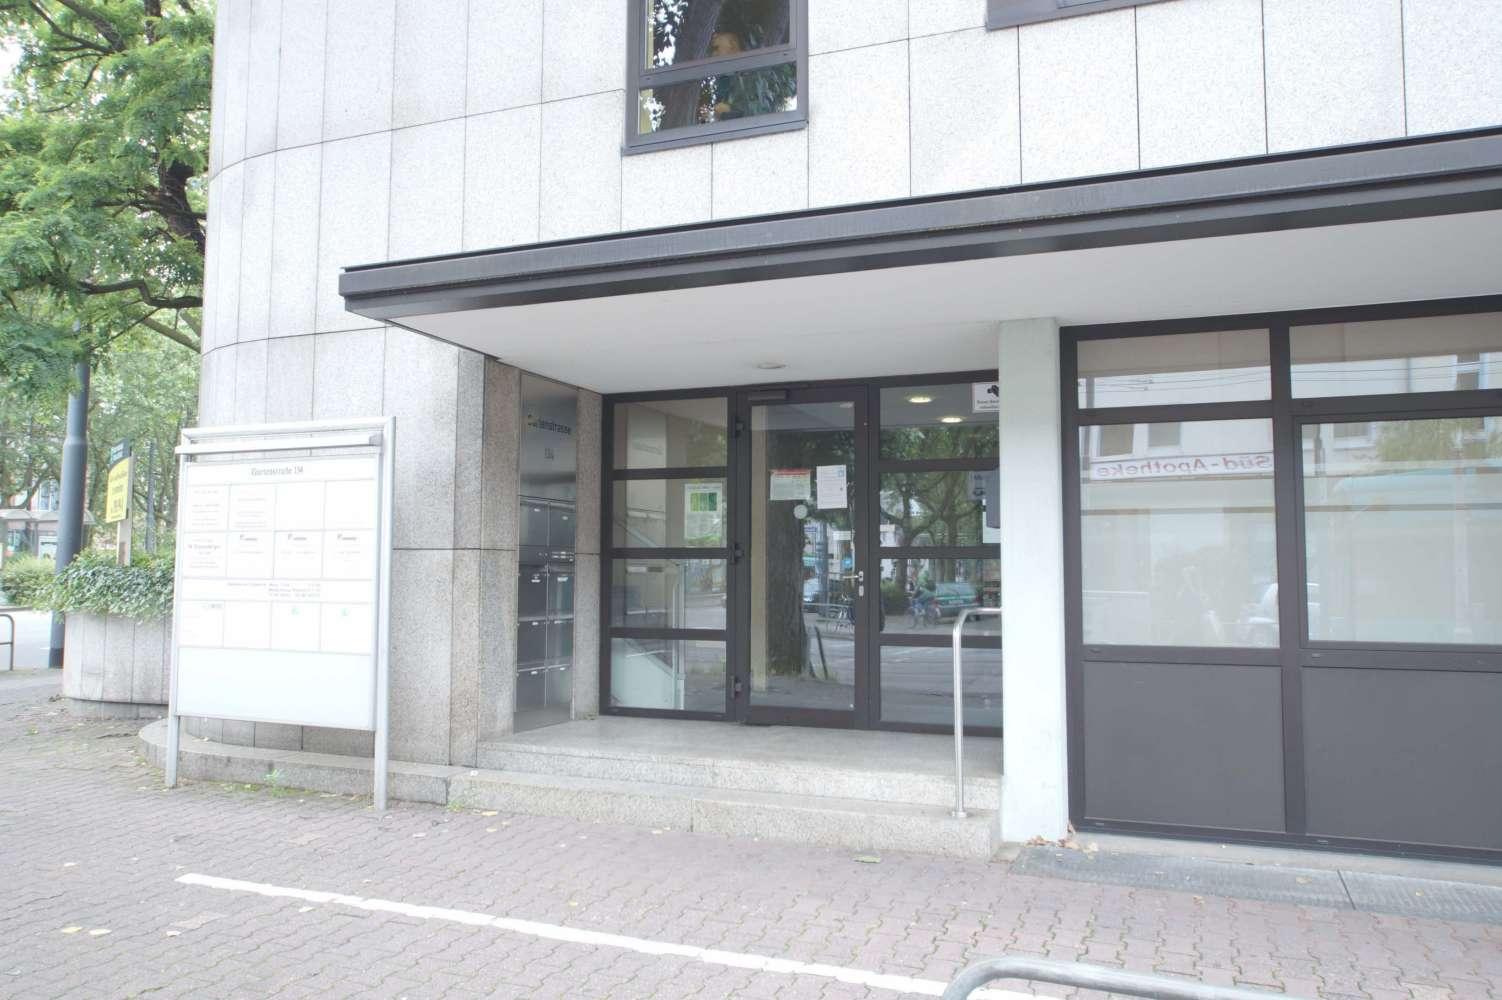 Büros Frankfurt am main, 60596 - Büro - Frankfurt am Main, Sachsenhausen - F2281 - 10010805